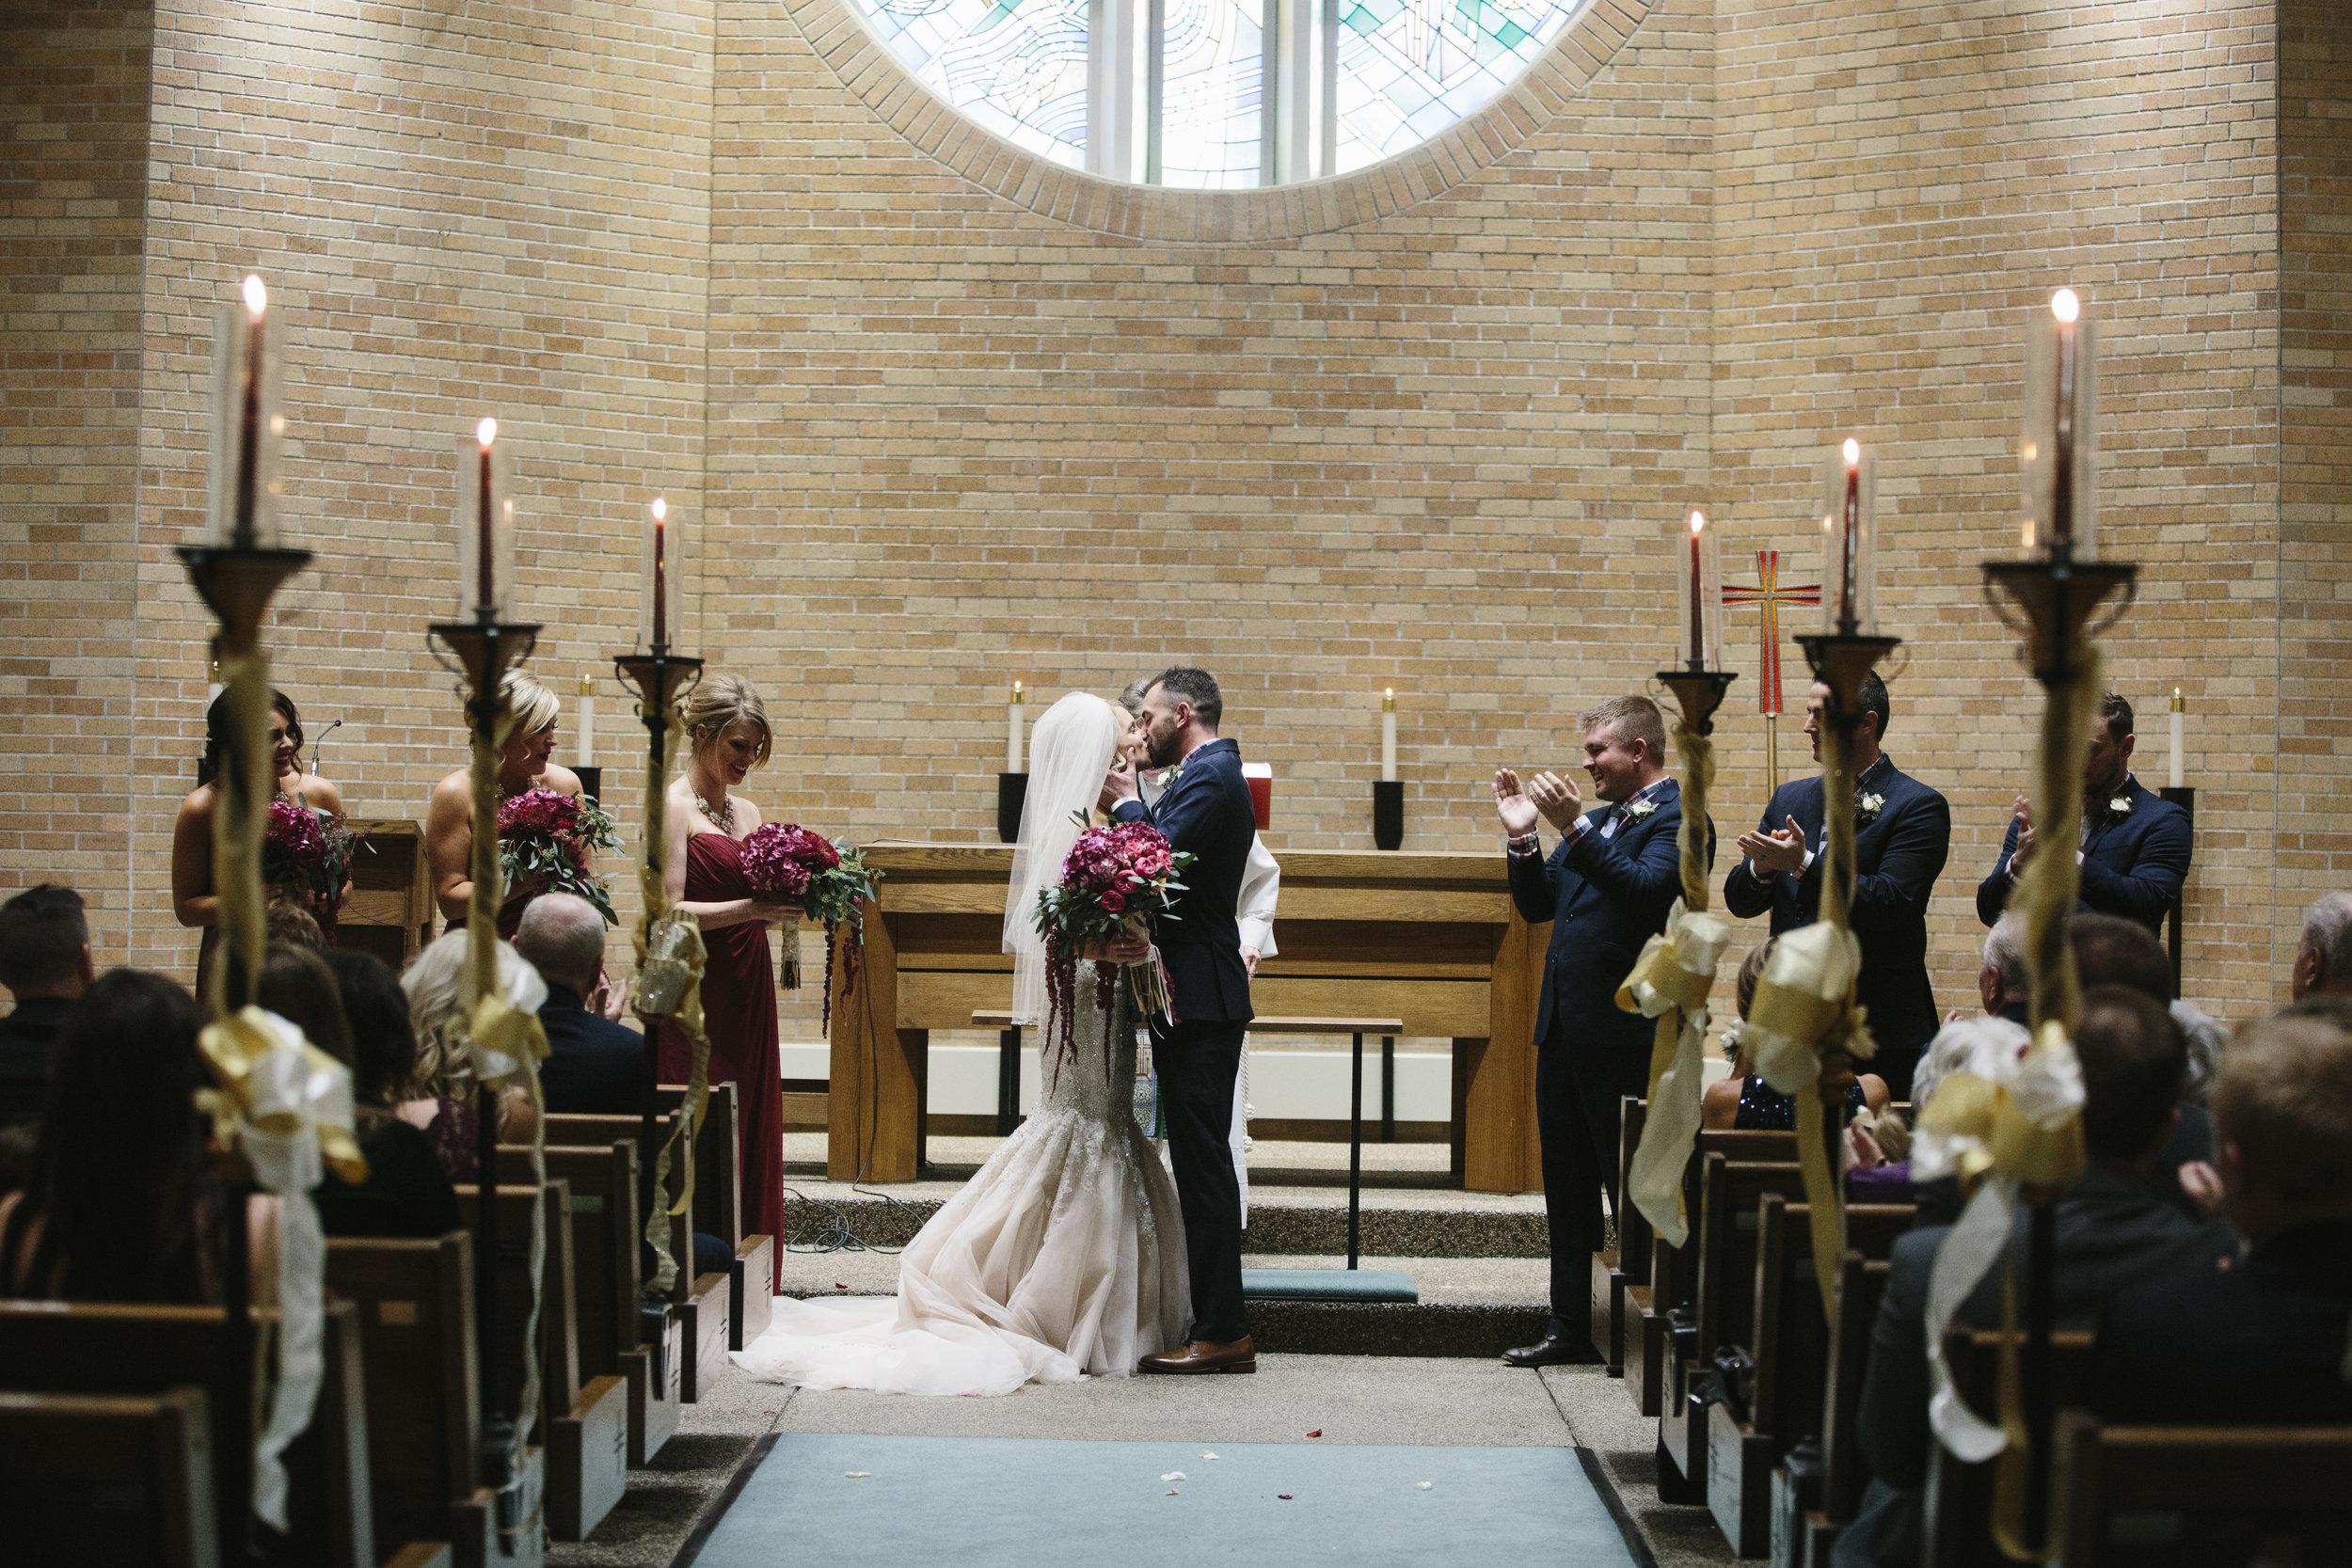 RachelandJustinwedding0353.jpg